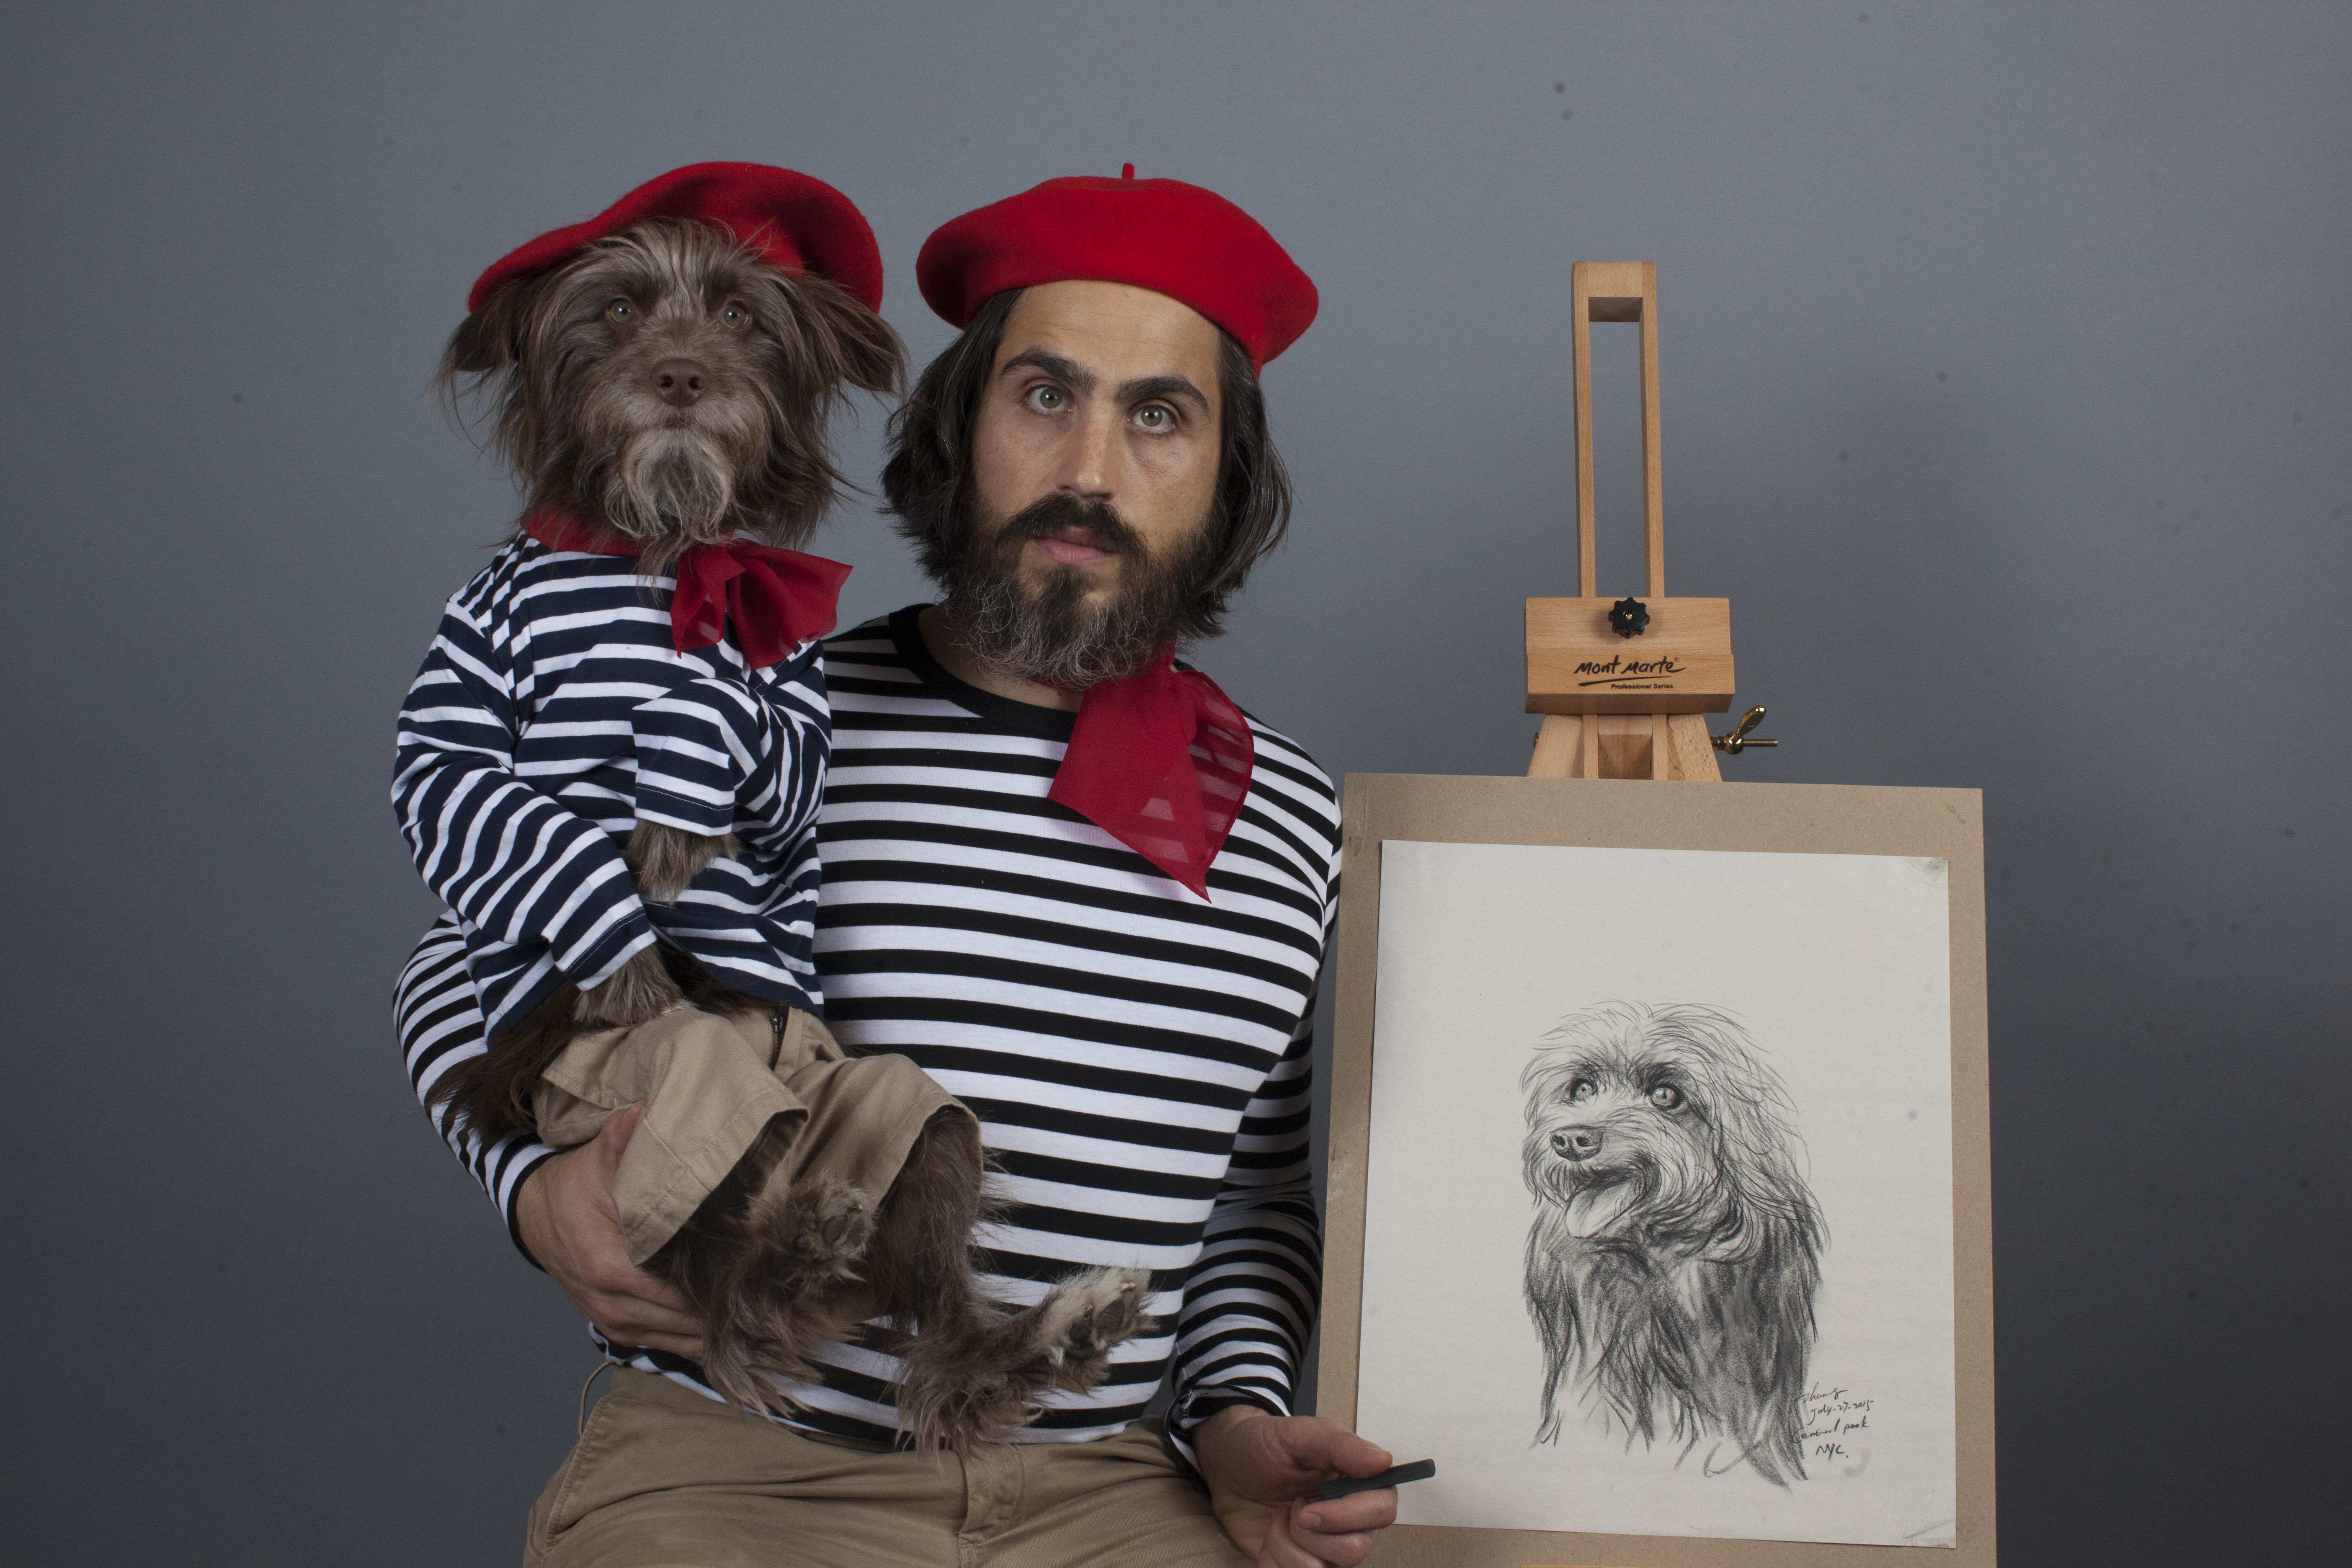 Episode 34: Topher & Rosenberg the dog